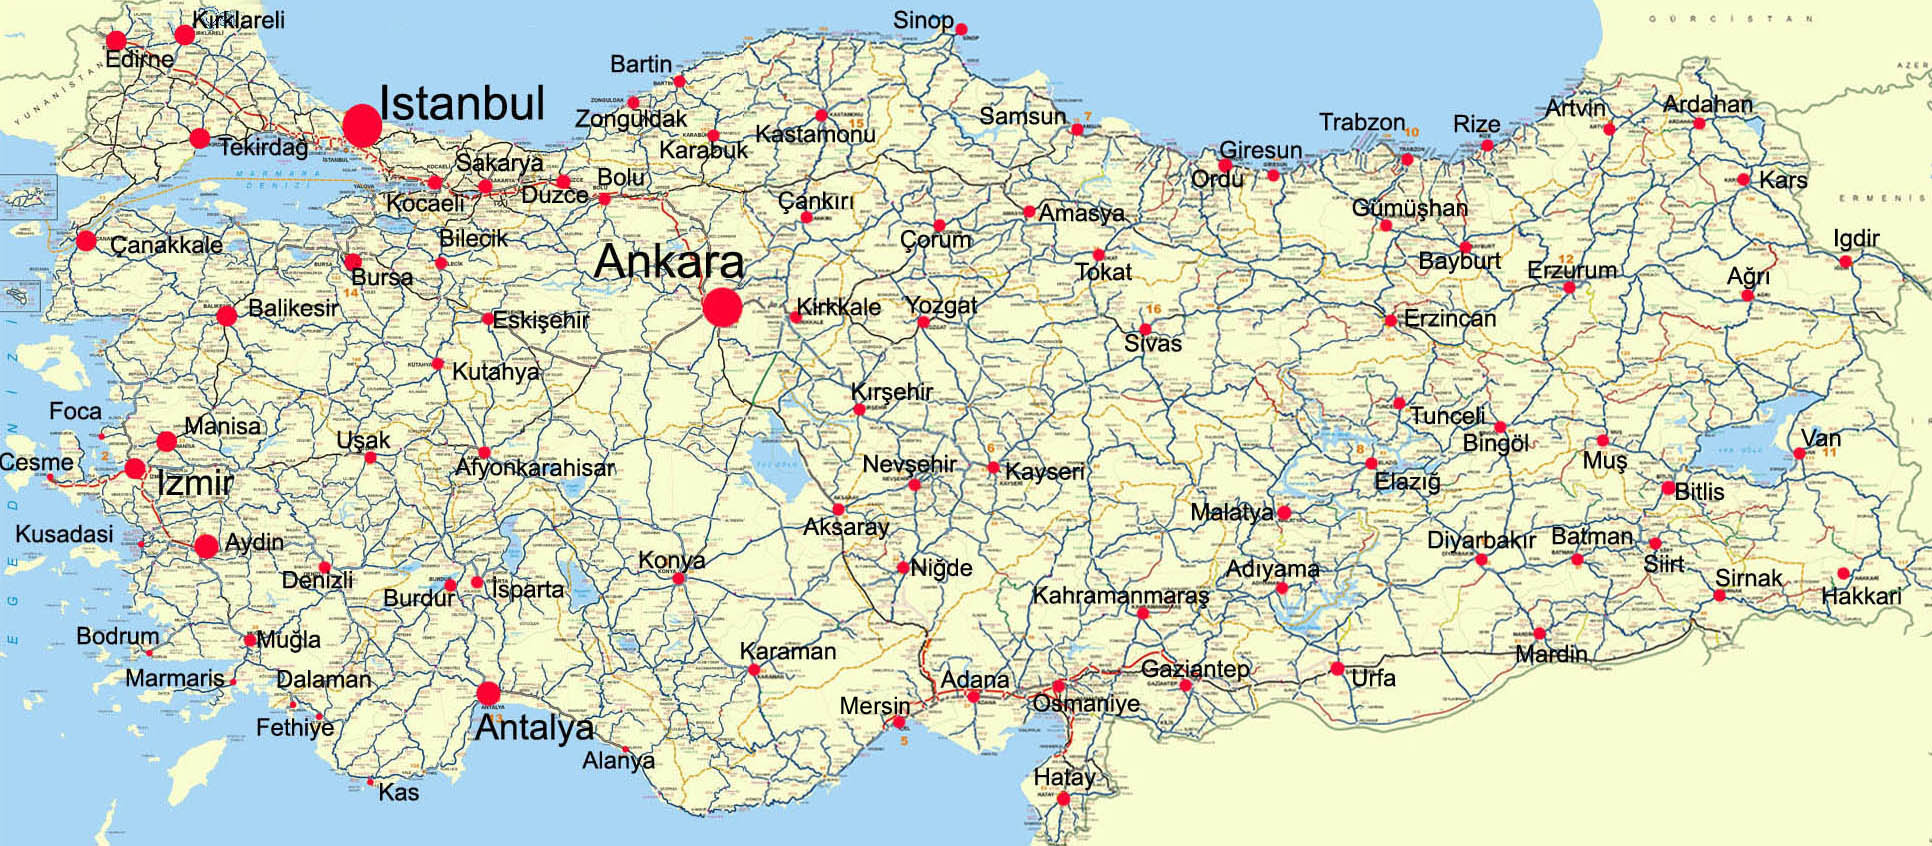 Turkey Map Turkey mappery